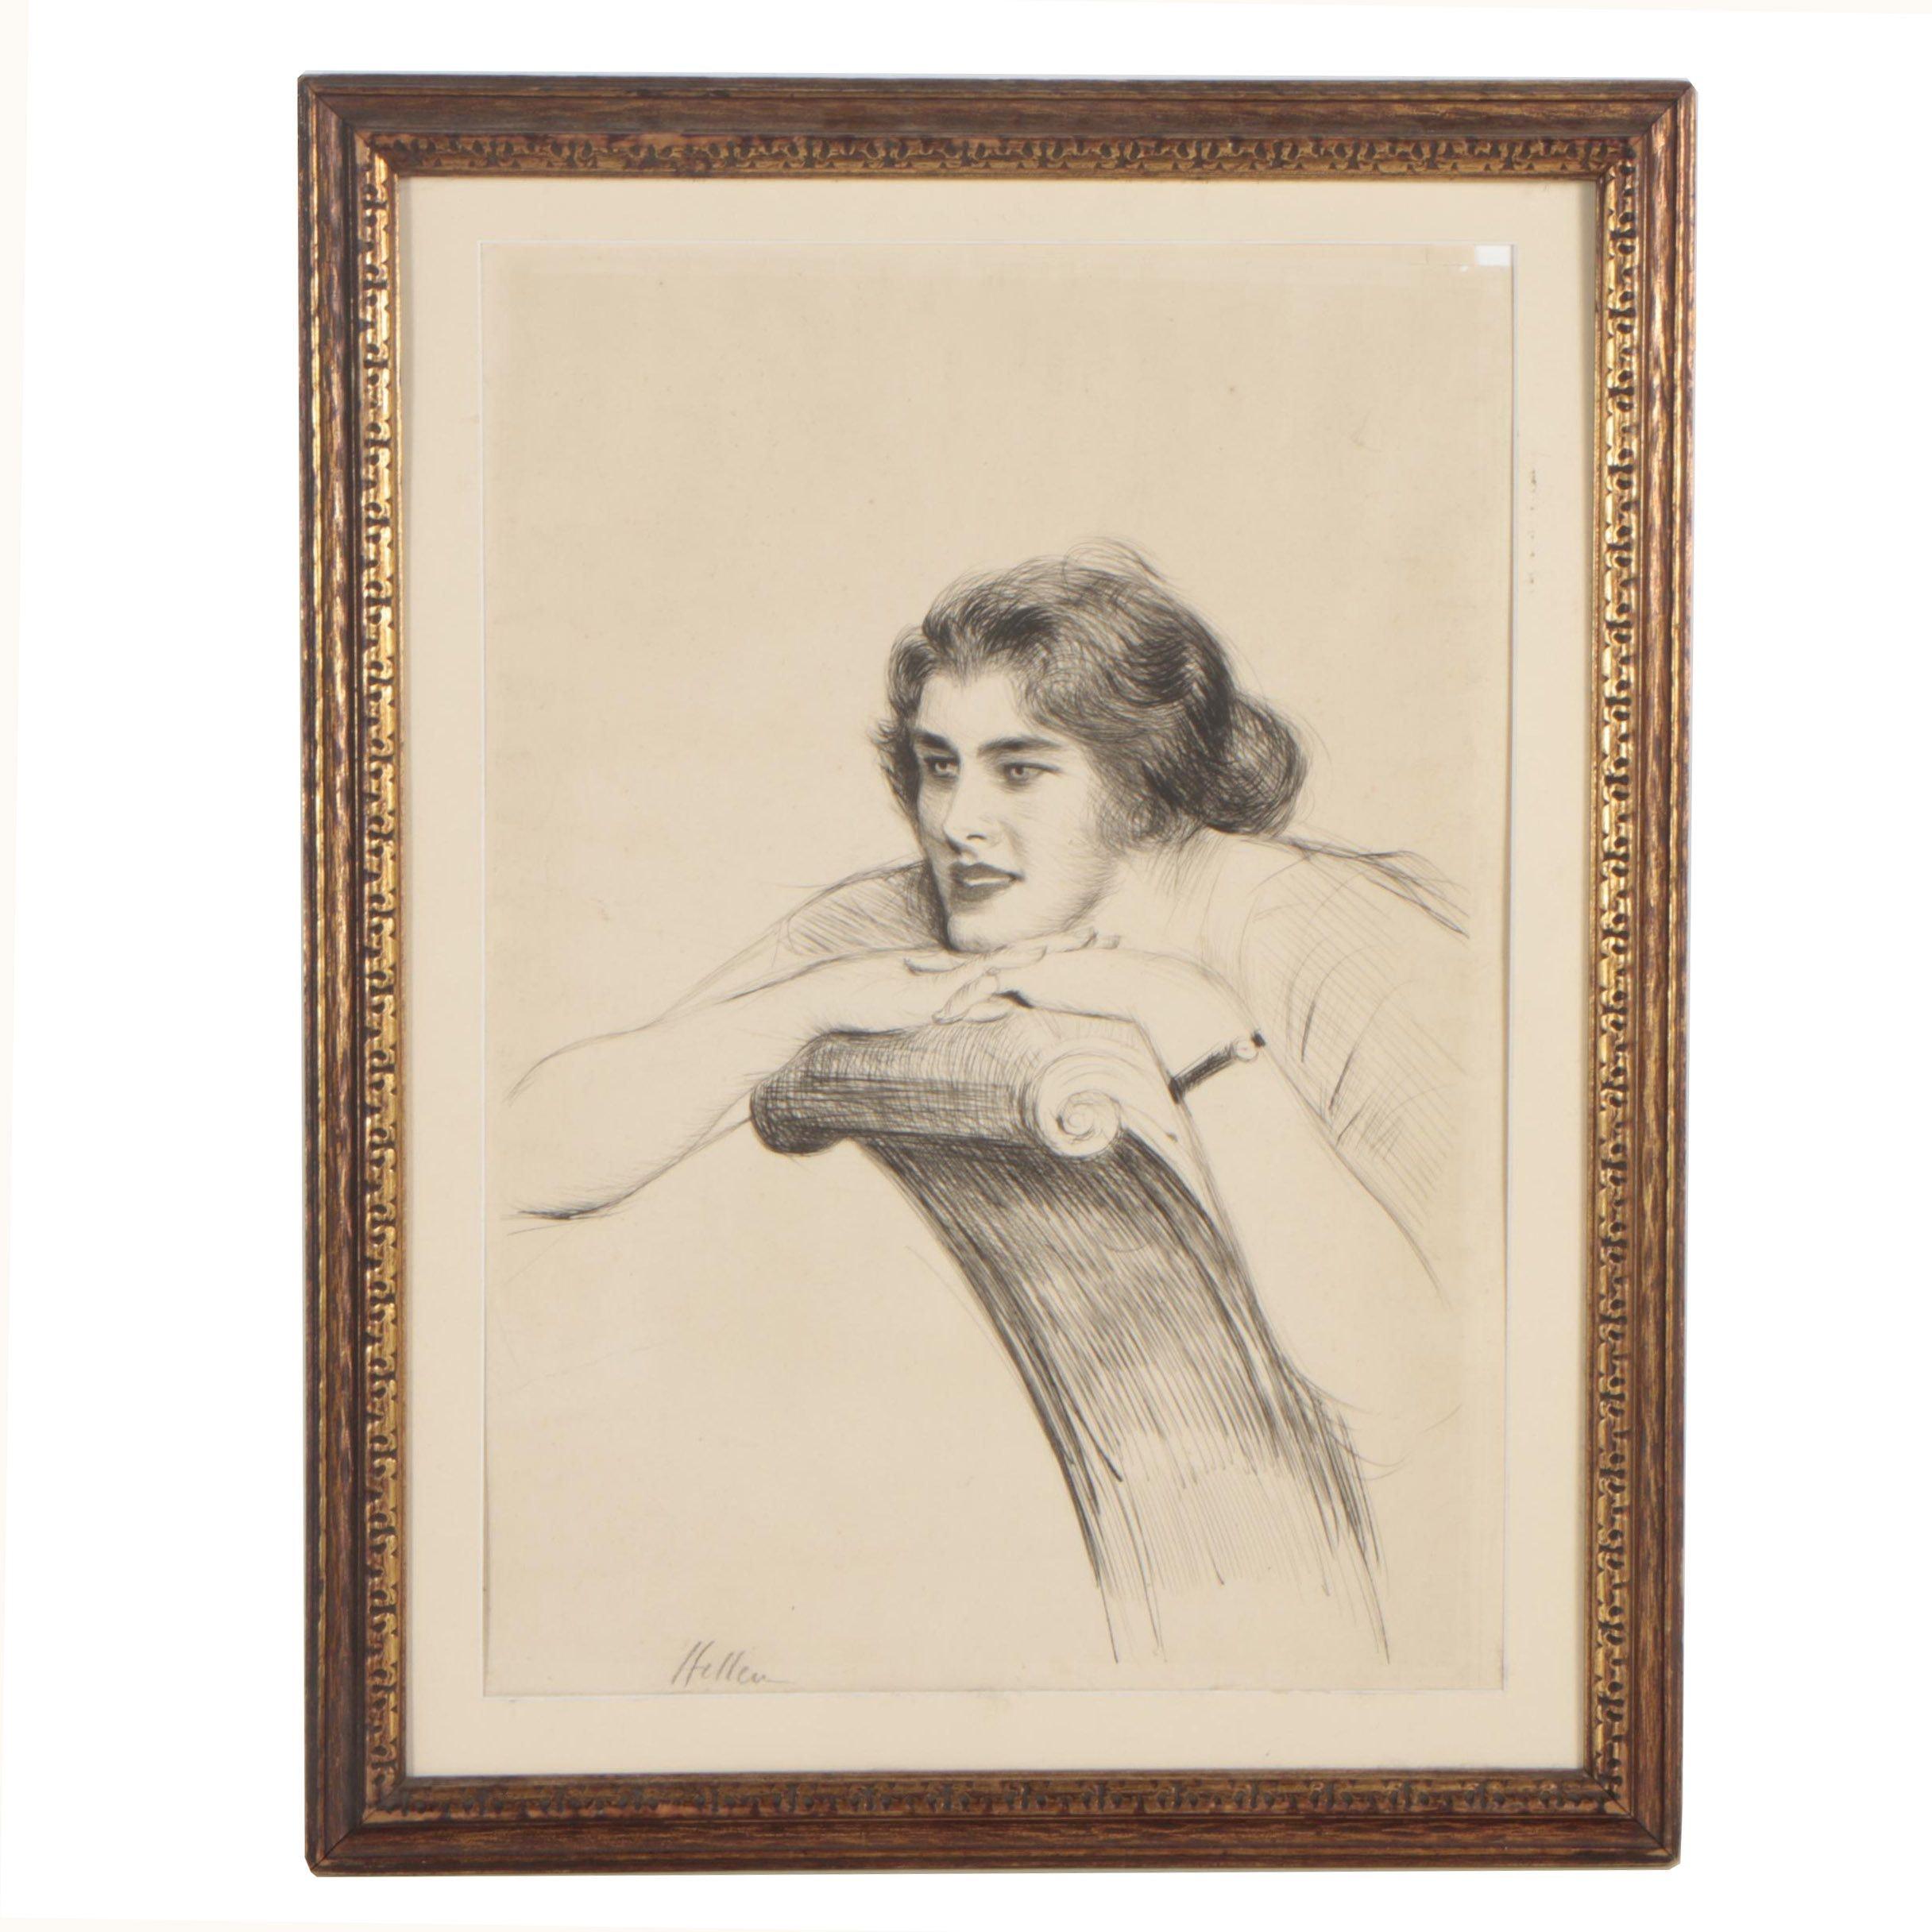 Vintage Engraving of Seated Figure